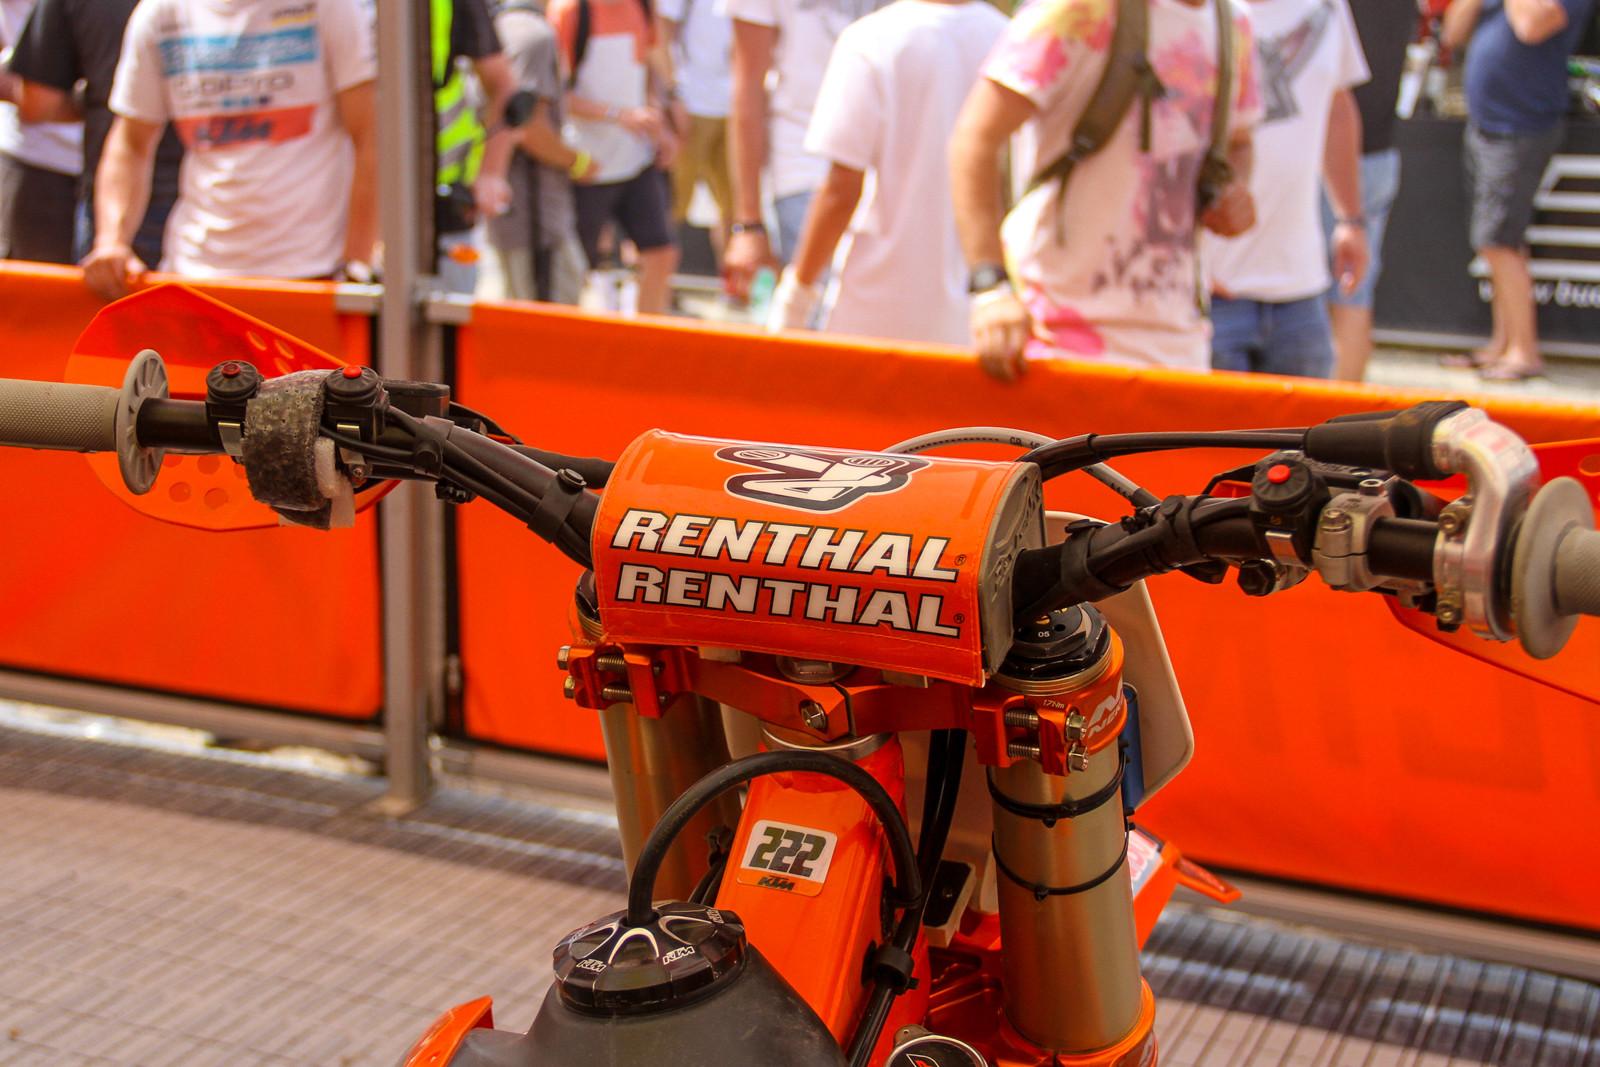 Antonio Cairoli however uses Renthal Fatbars.